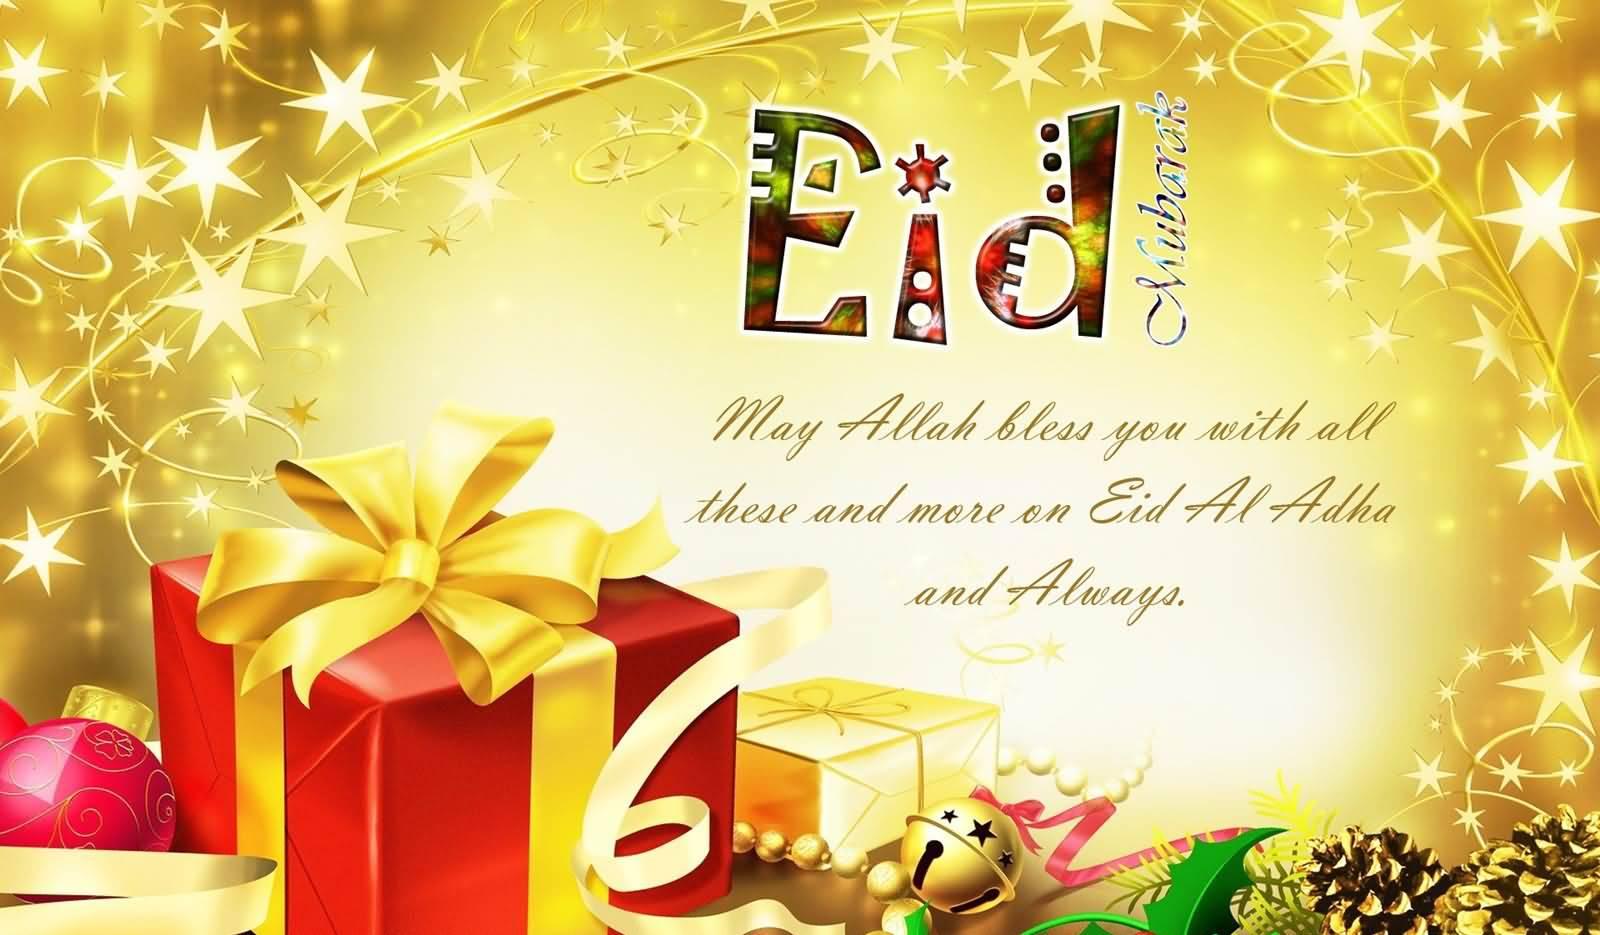 Eid ul Adha Wishes and Greetings 2017